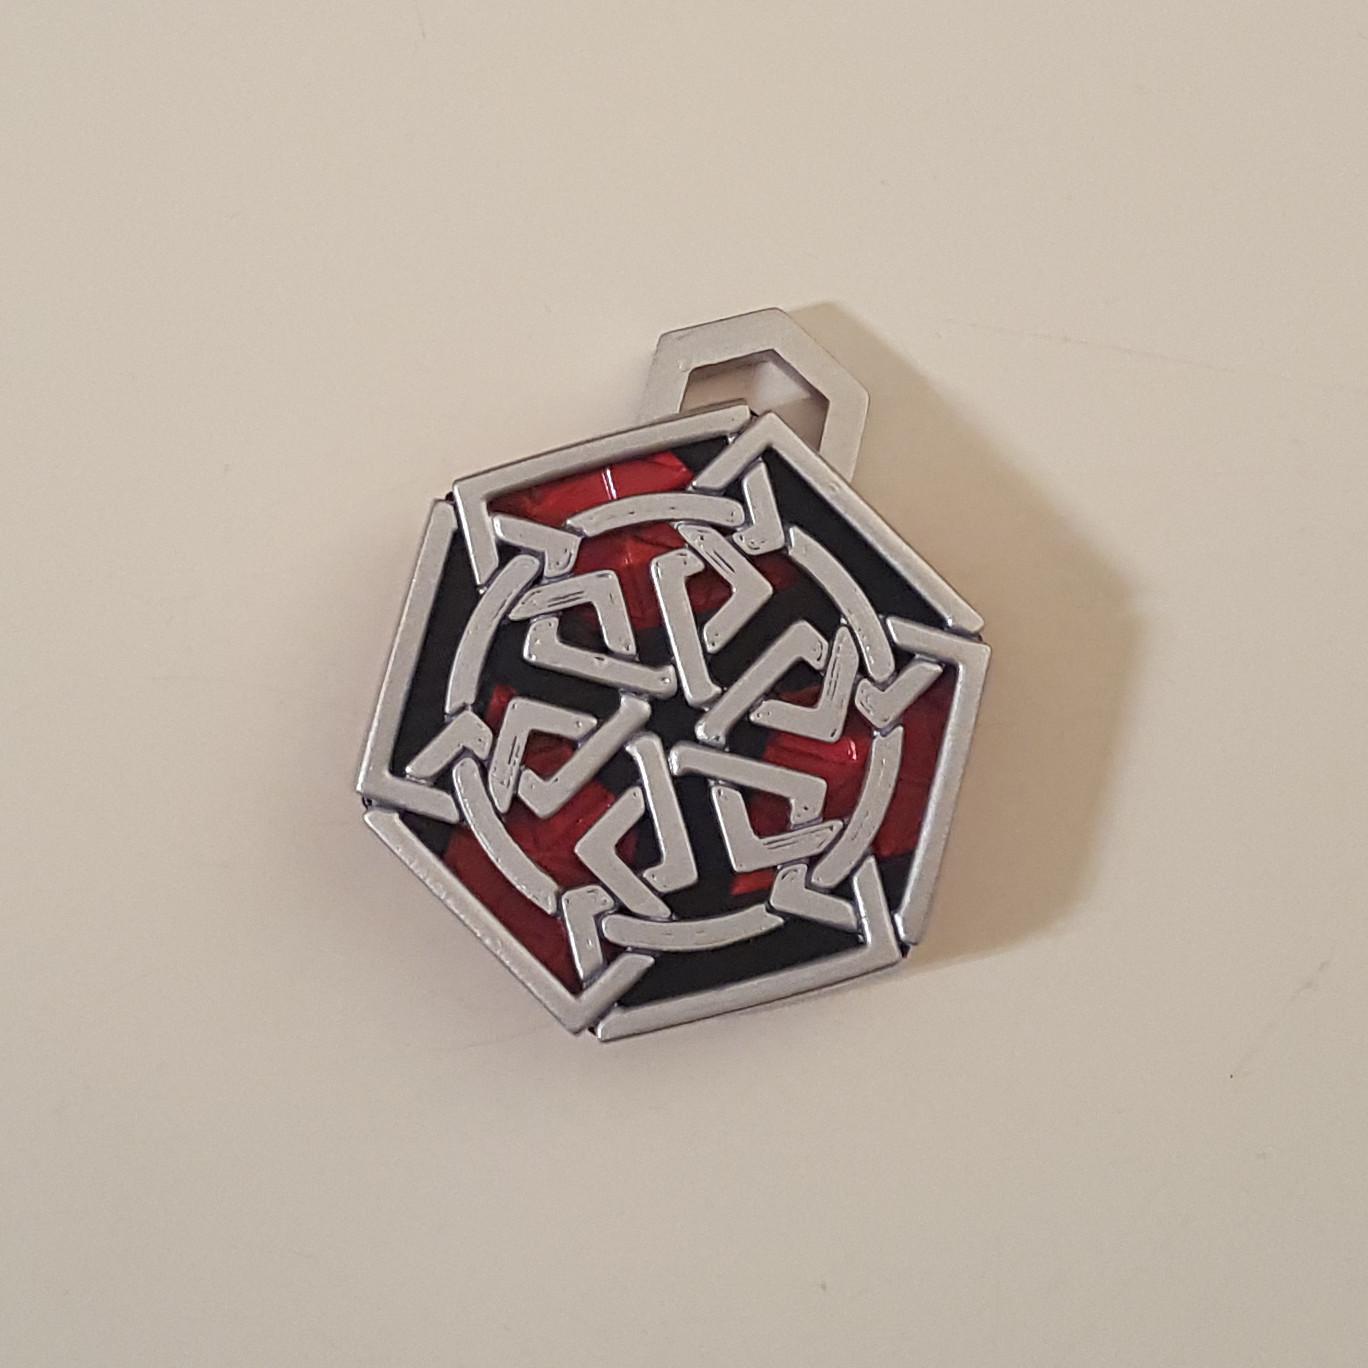 medallion top view.jpg Download free STL file Secret geometry medallion • 3D printable model, Job